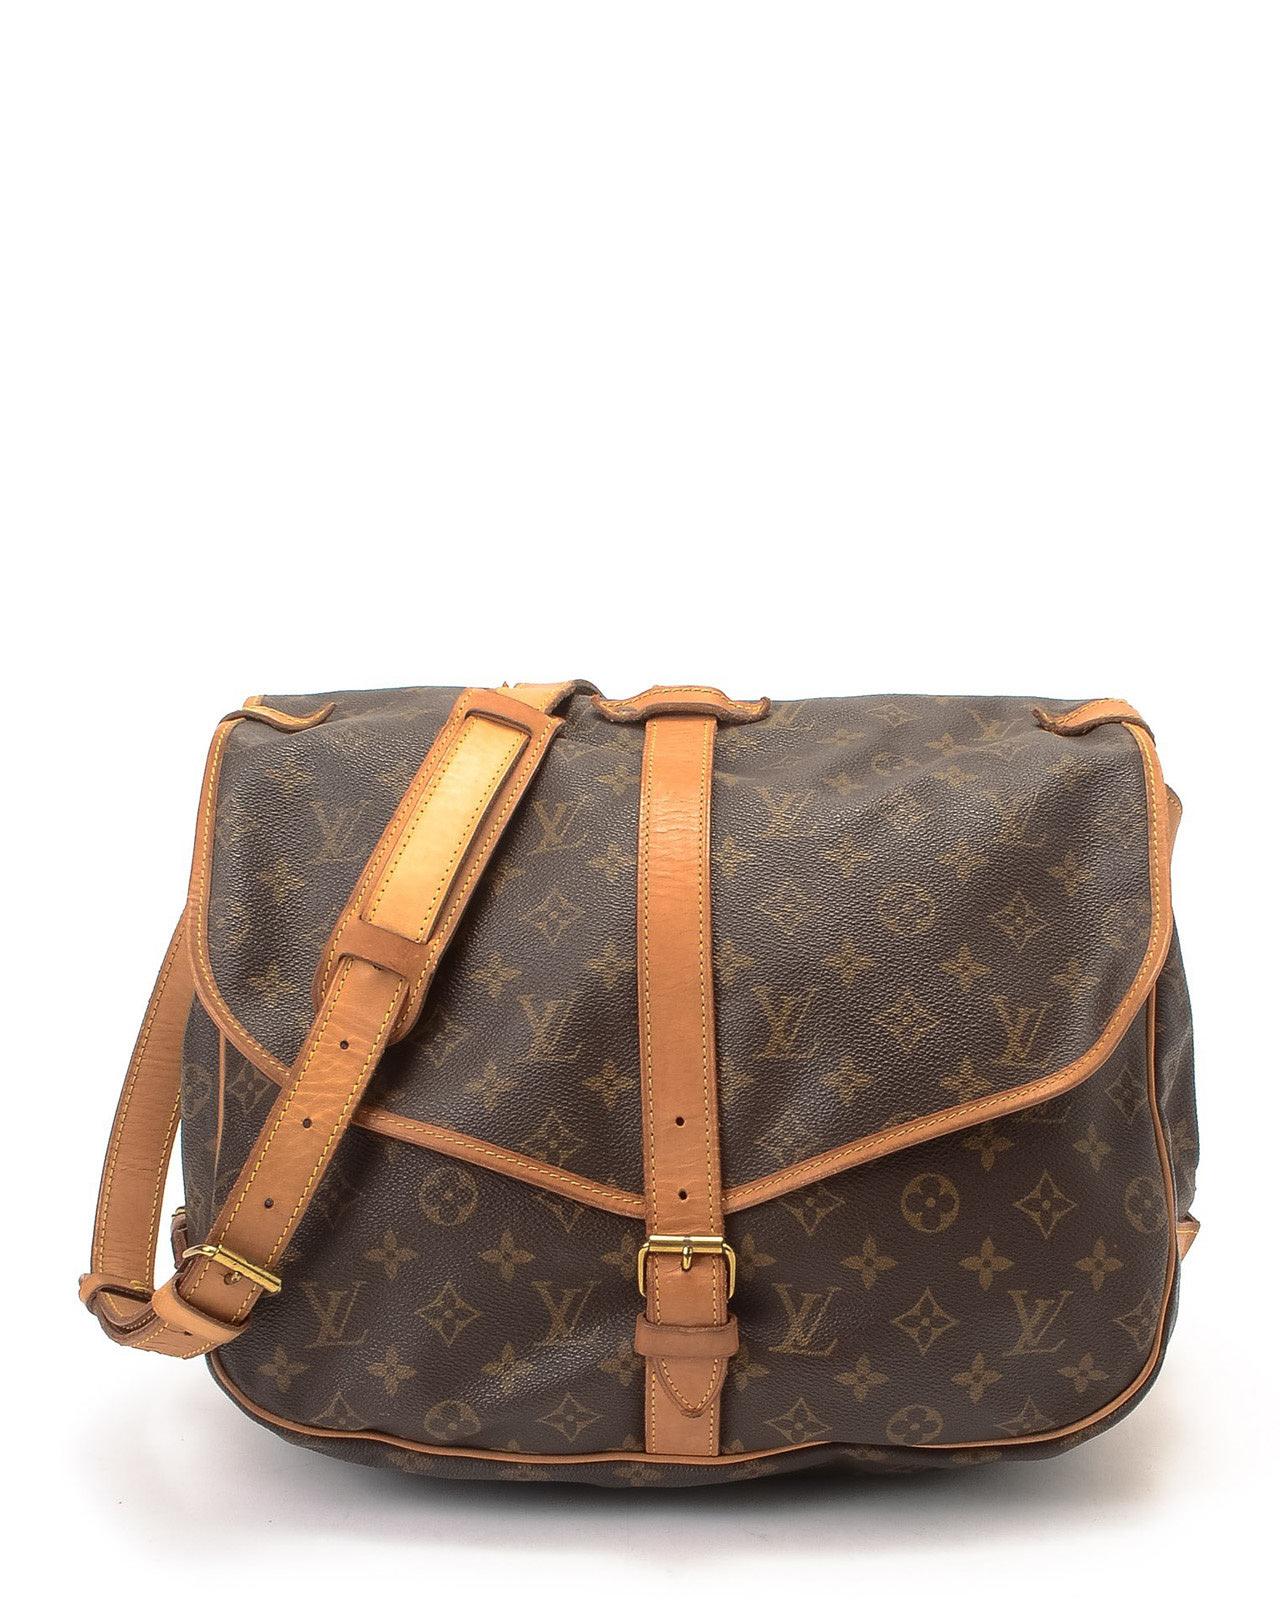 Unique  Bags LV CAPUCINES BB Bags Women Full Leather LV Crossbody Bags 7